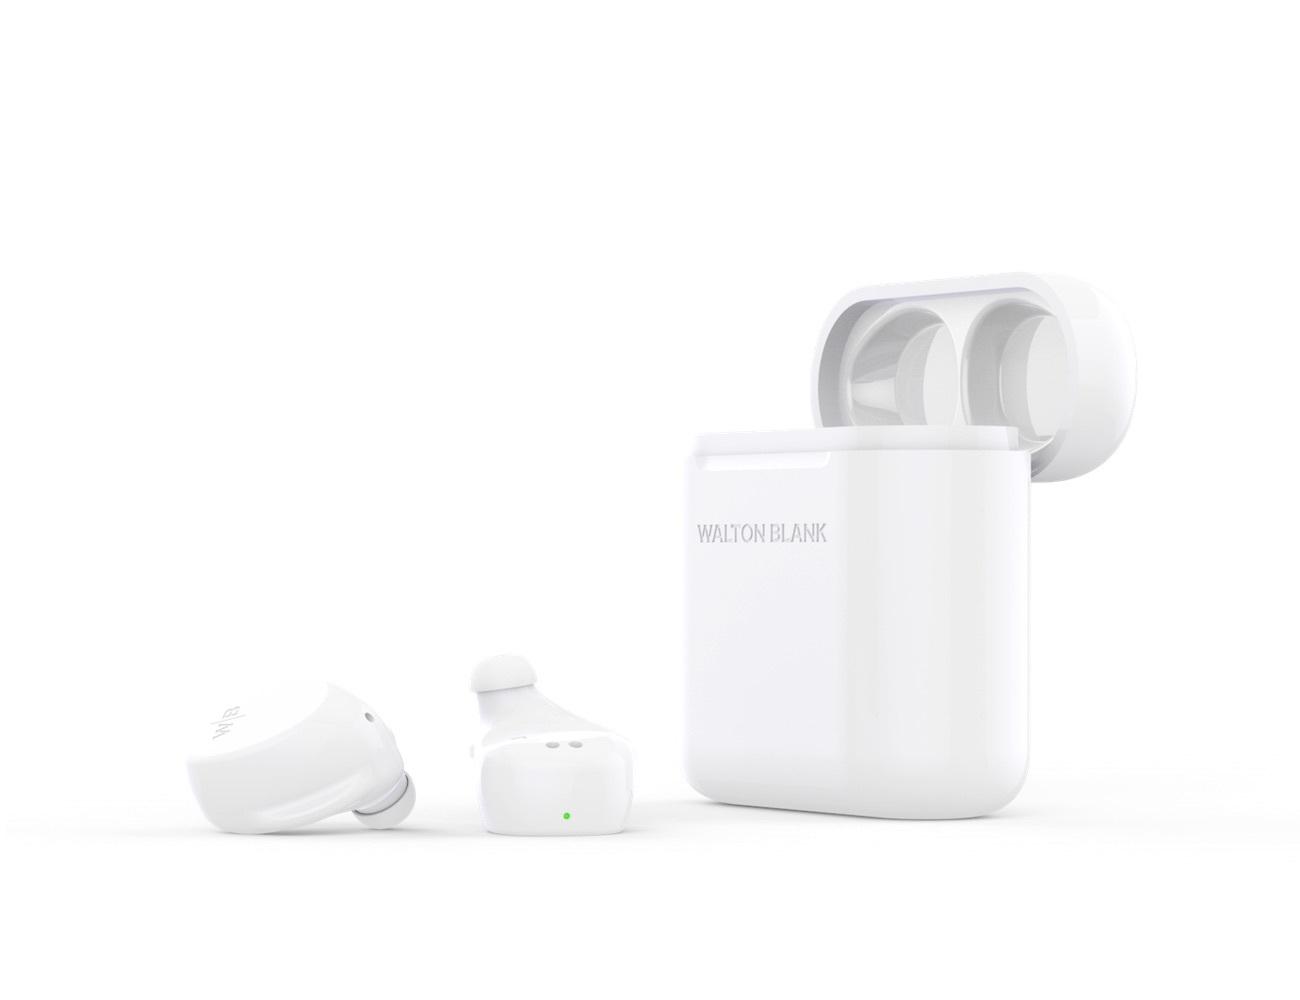 Jogab Limitless Waterproof Wireless Earbuds